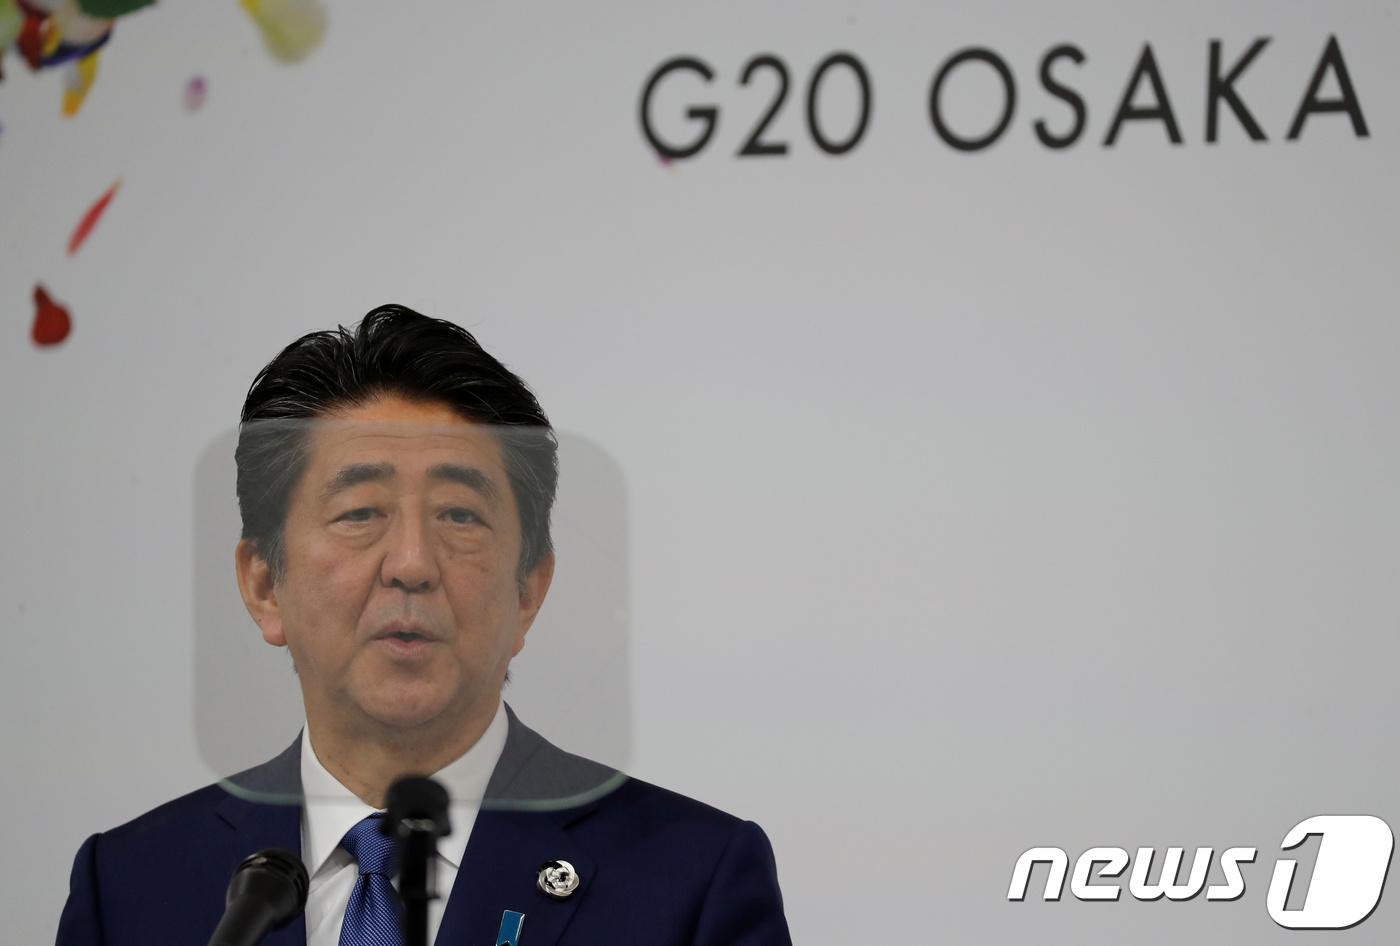 "[G20]i??e² ""G20 i?i??e?¤, i°¨e³?i??e?? i??i?e¬´i? i??i??i?± i??i?¸"""